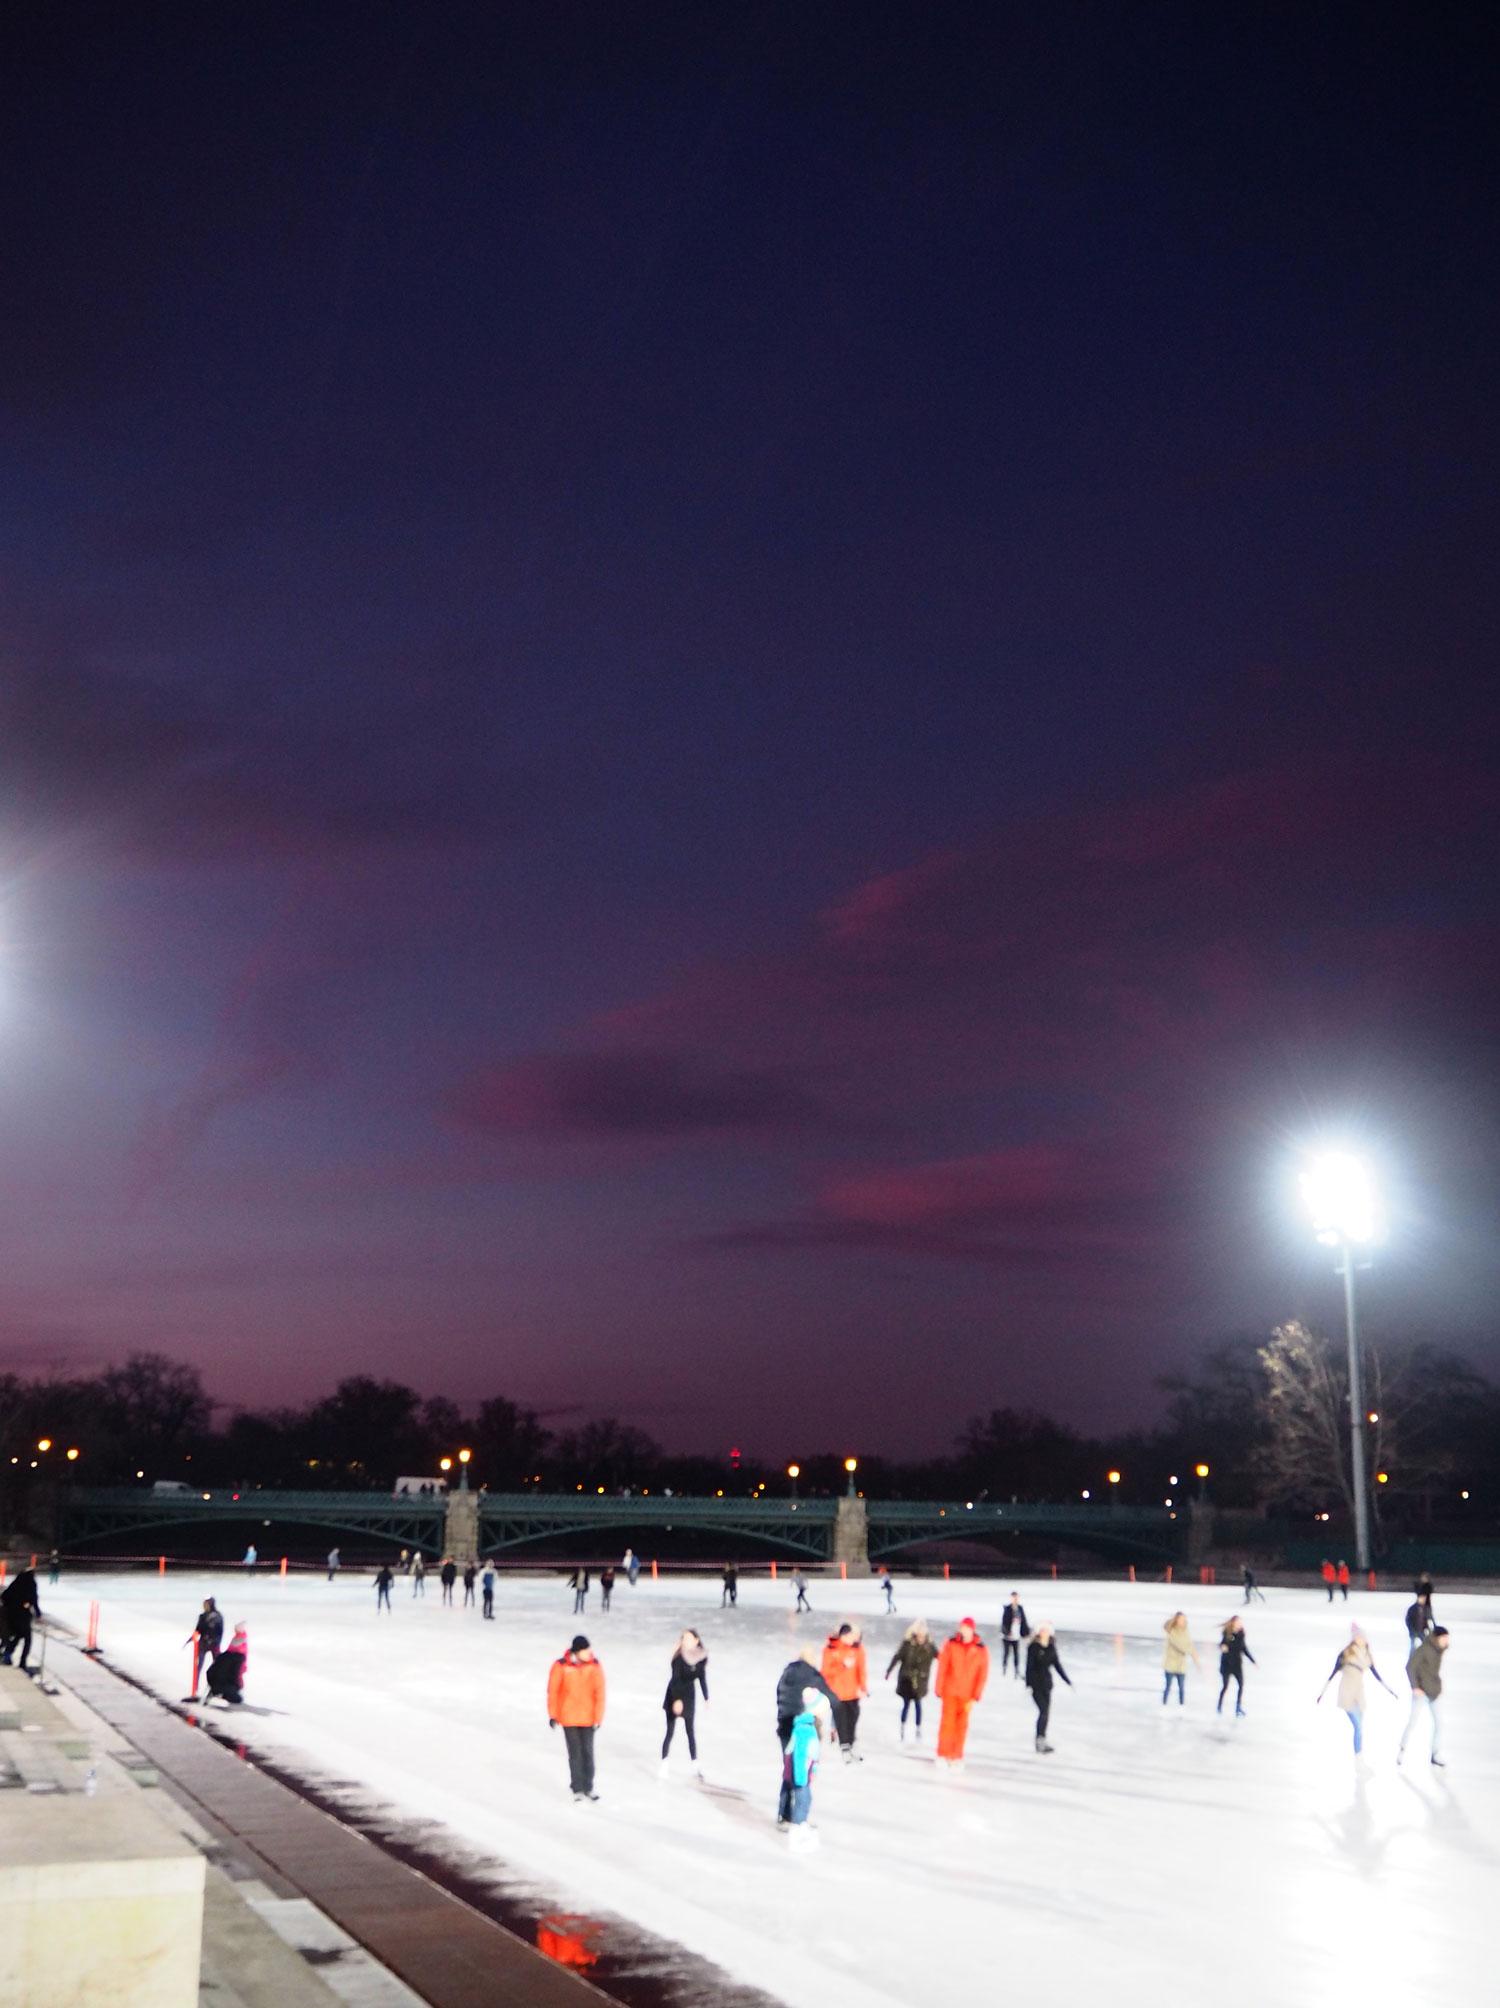 ice-skating-travel-blogger-budapest-zoe-newlove